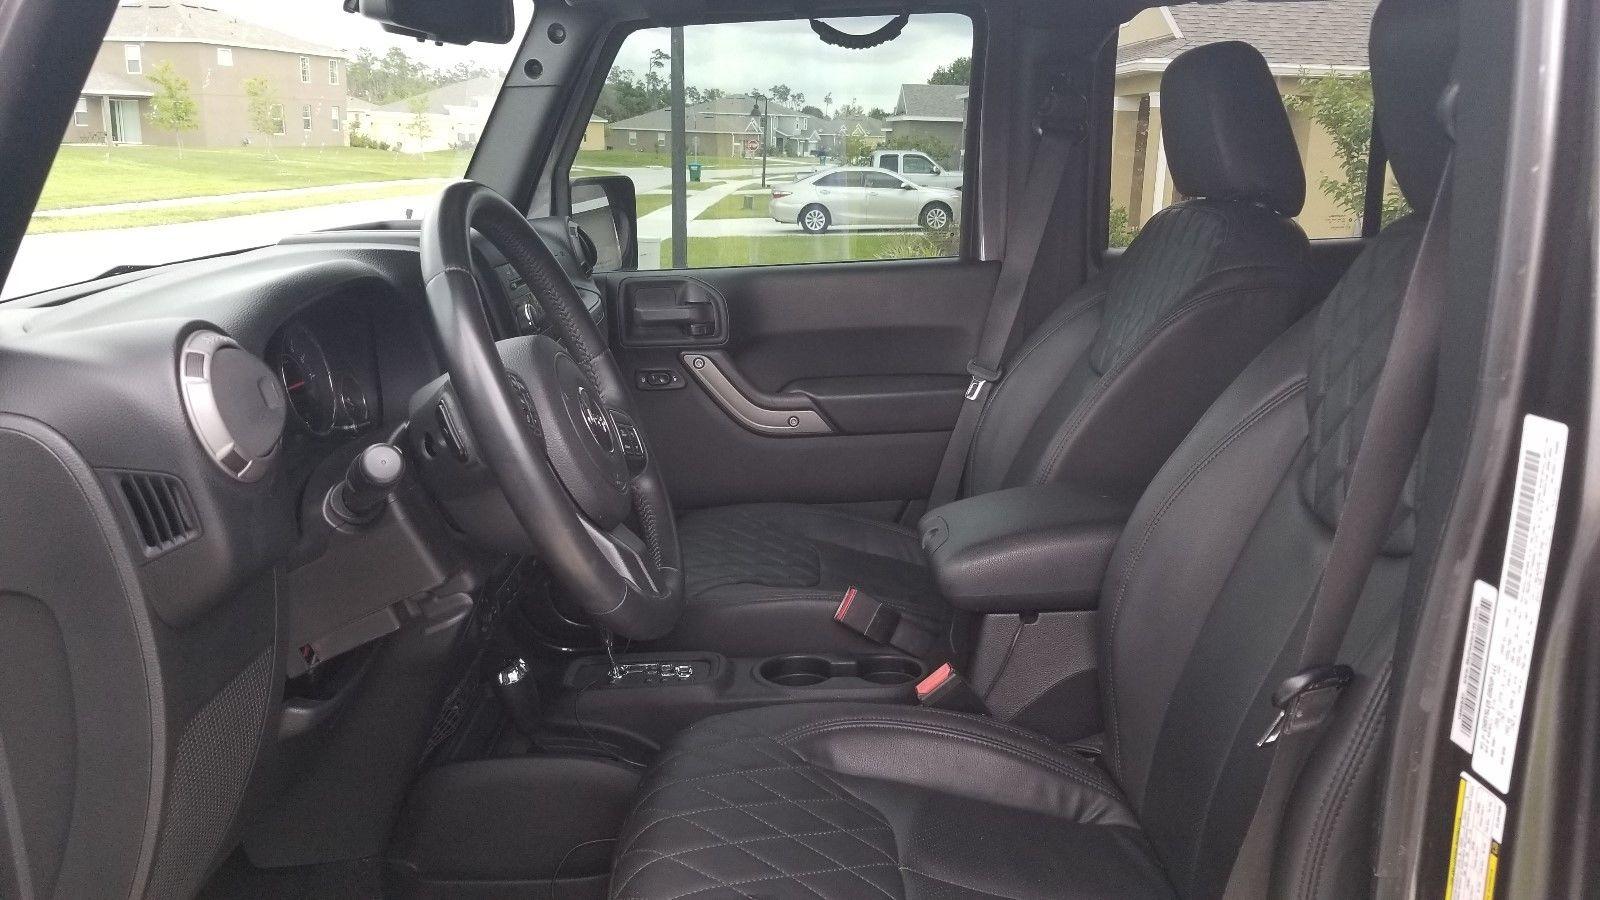 Great 2014 Jeep Wrangler Unlimited Sport 35 Lift Fox Shocks 37inch Jk Leather Seats Nitto 488 Gears Jw Speaker 15k Invested 2017 2018